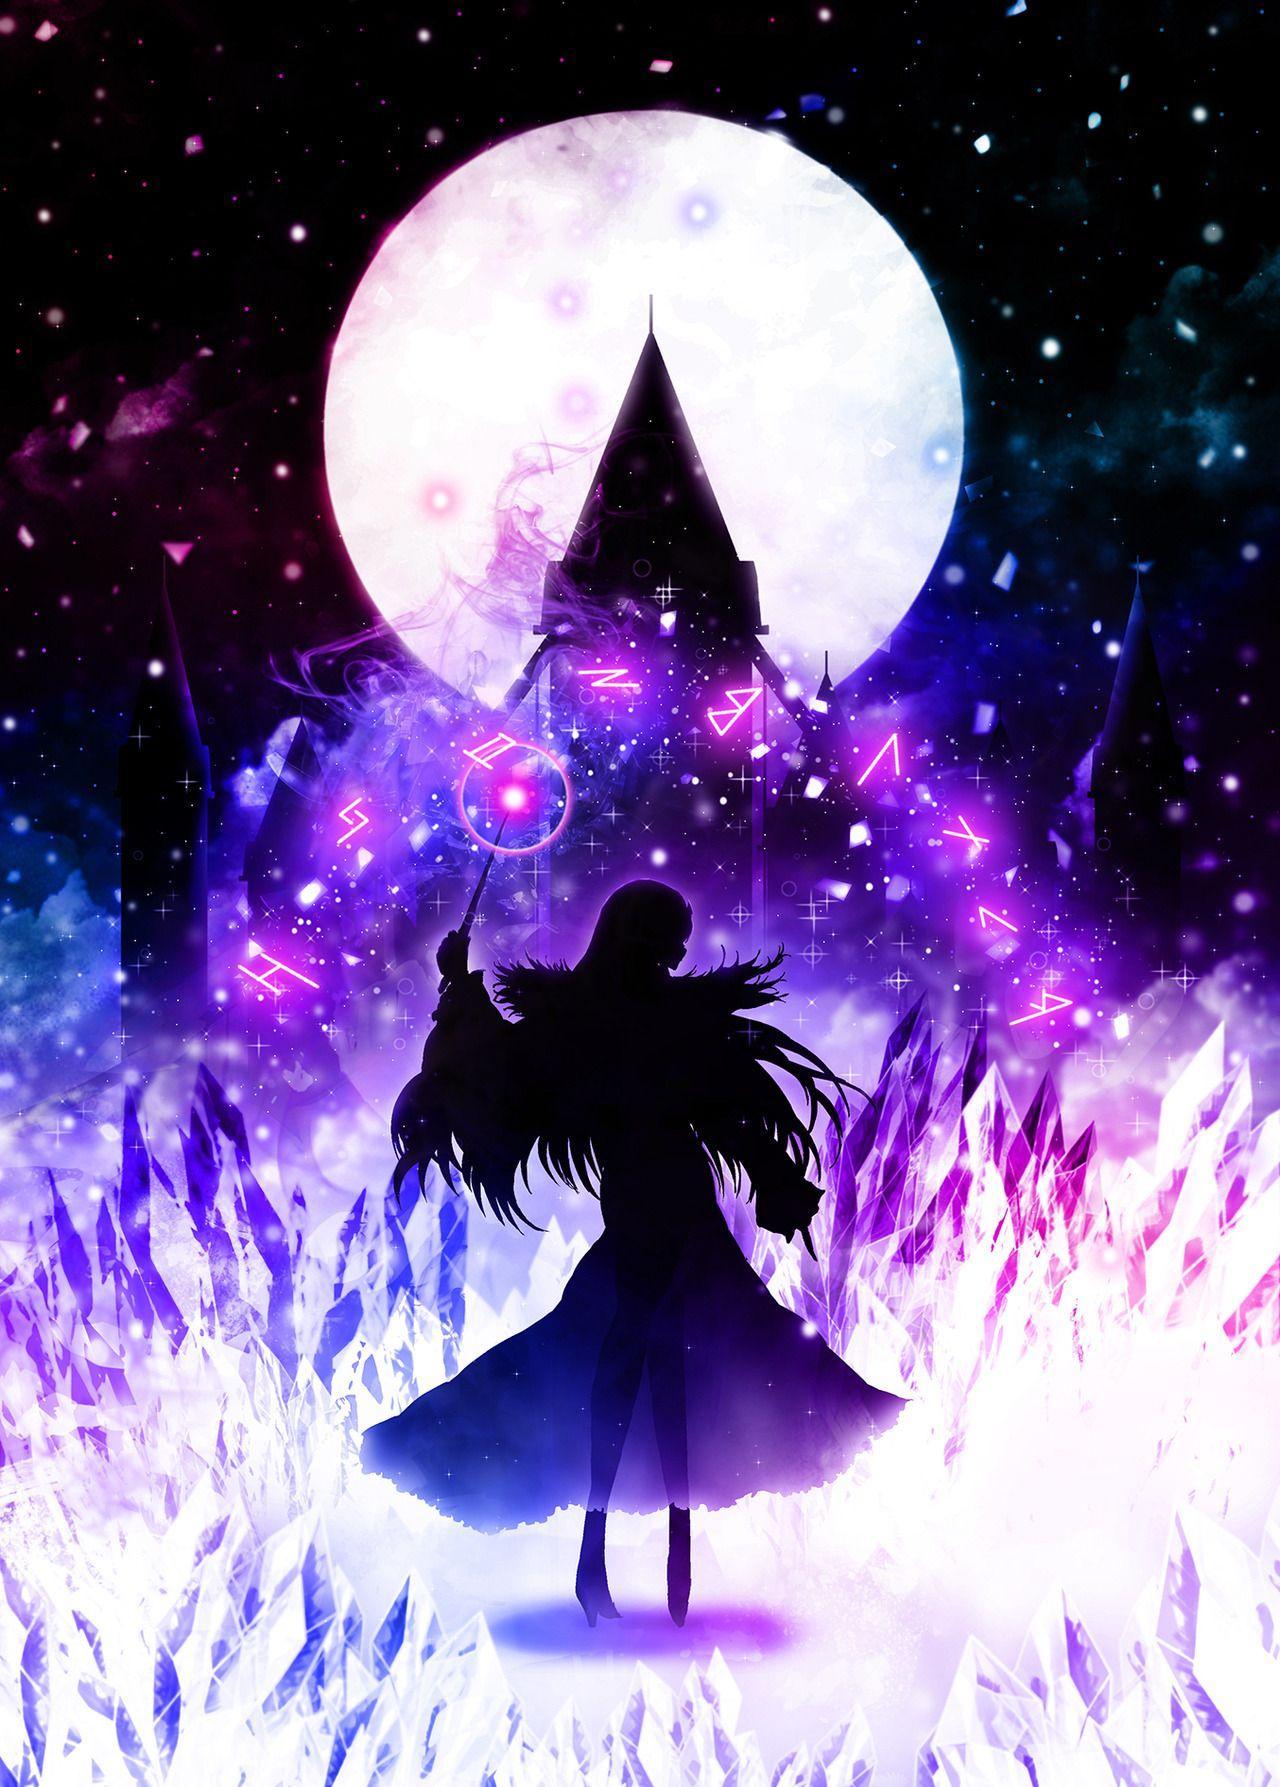 Animepopheart ハラダミユキ スカサハ スカディ Scathach Skadi Fate Grand Order Republished W Permission Visit My Fb Insta Twitter 壁紙 アニメ イラスト かっこいい 壁紙 アニメ